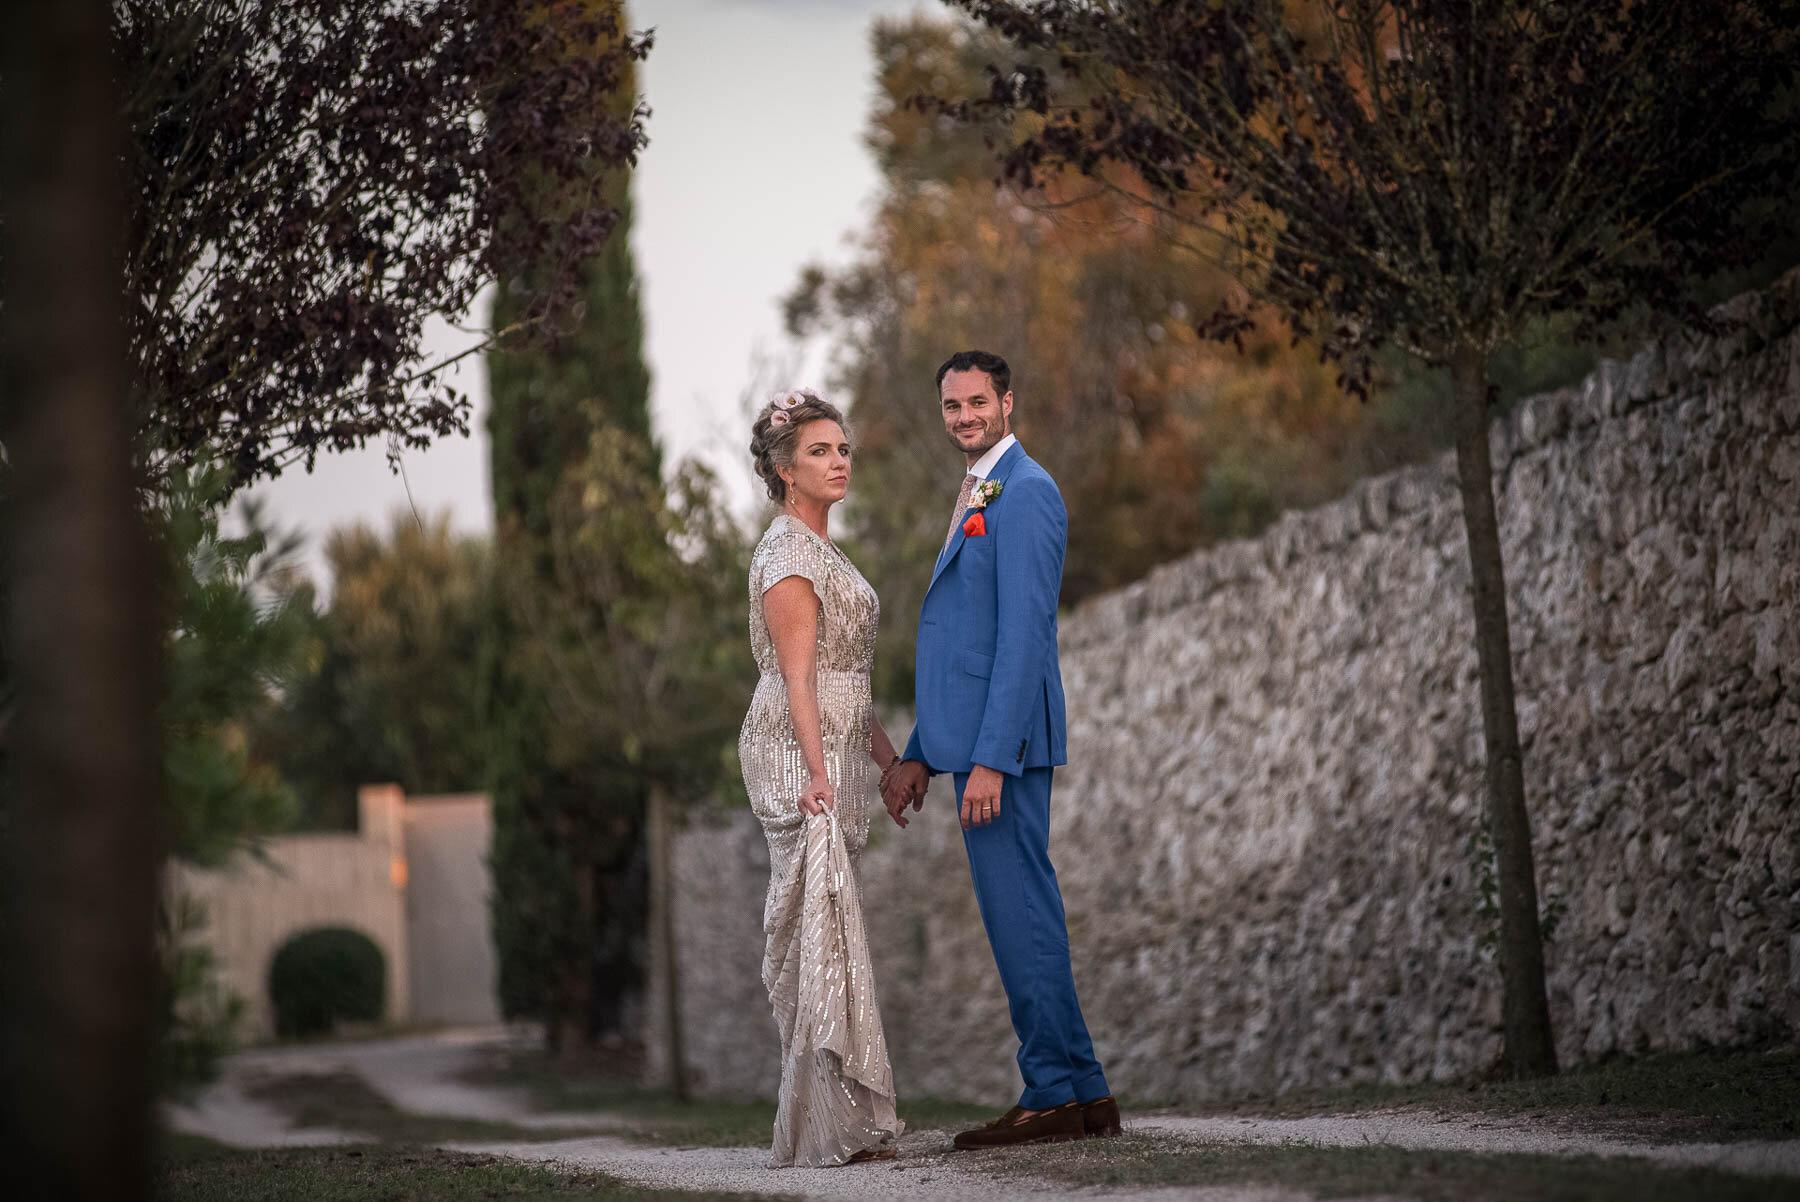 english wedding in salento 24.jpg